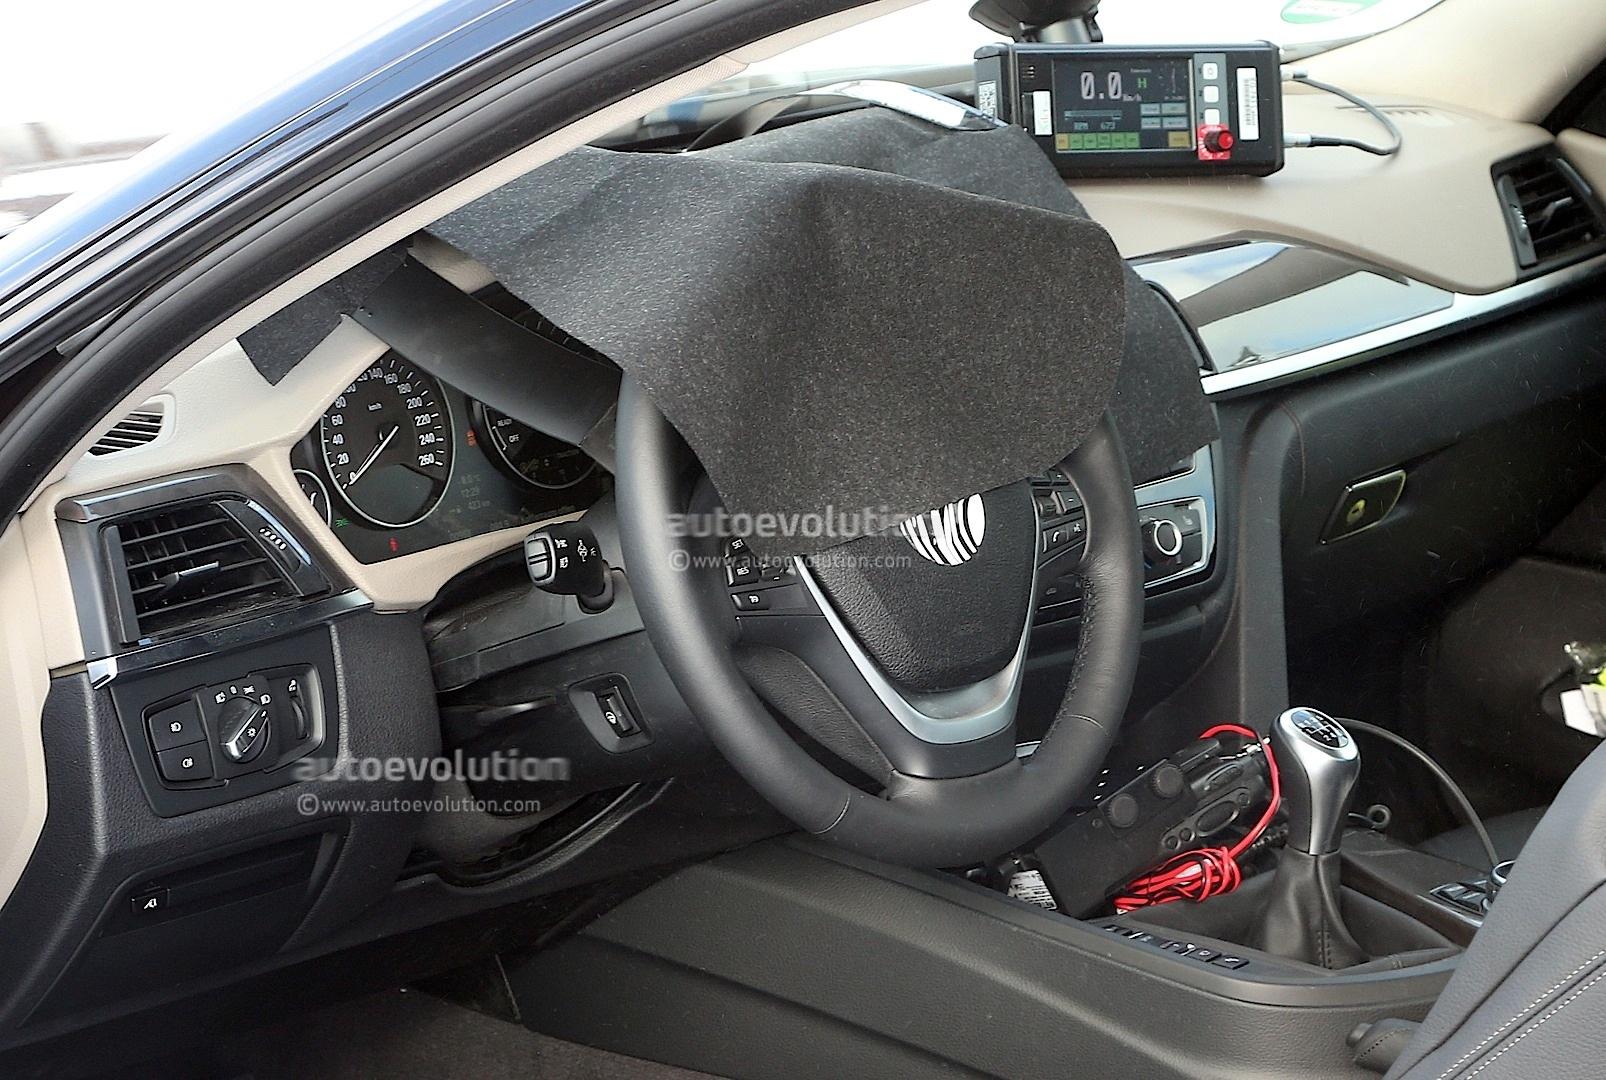 Spyshots Bmw 4 Series Coupe Interior Revealed Autoevolution